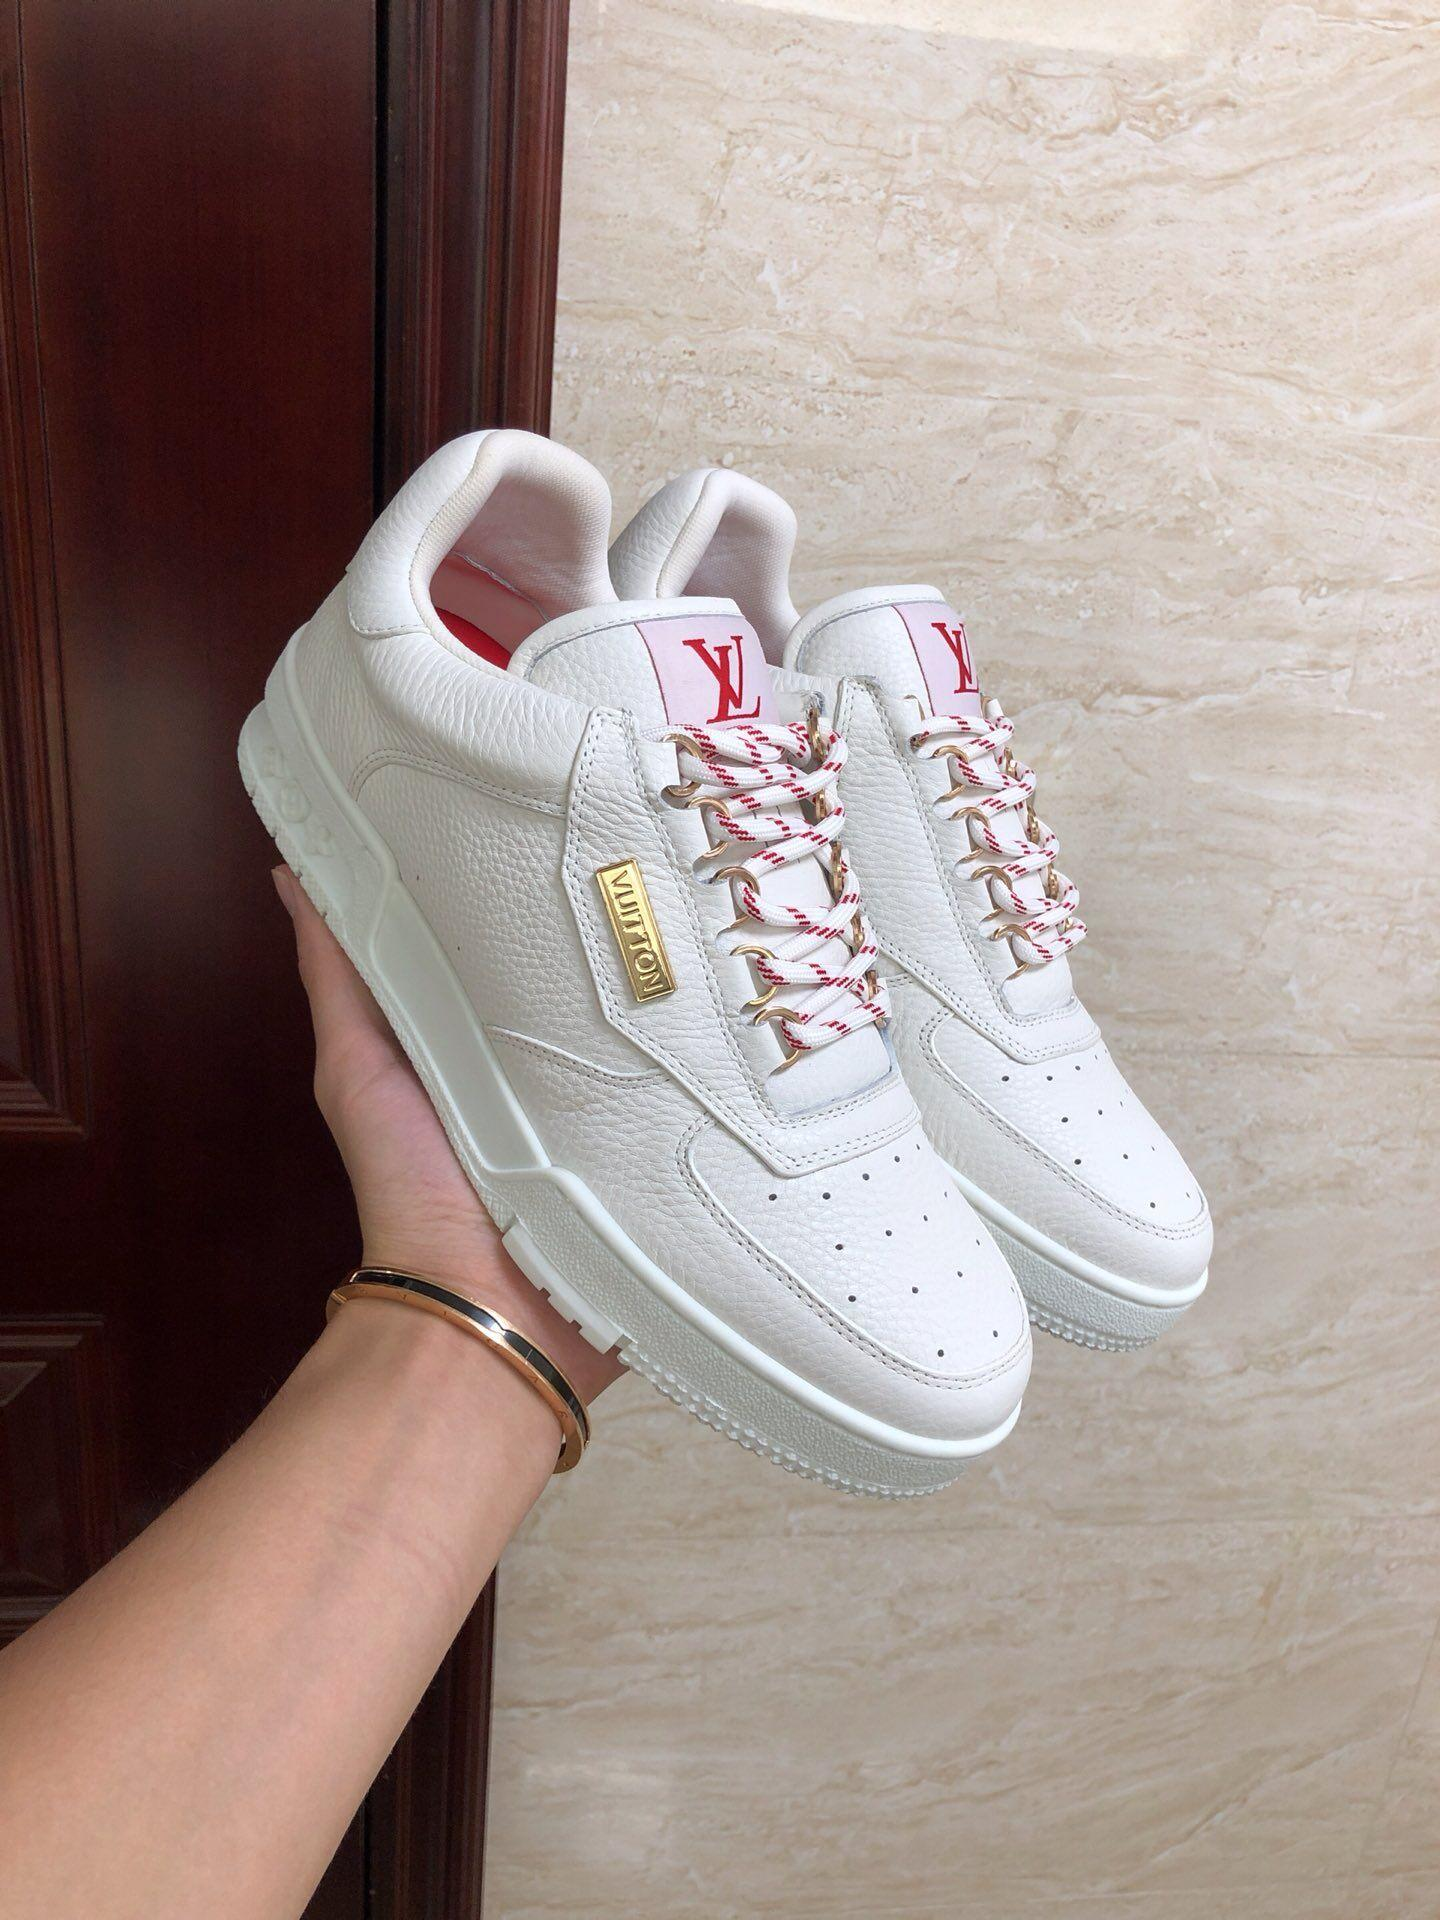 lv trainer sneaker lv  vintage basketball sneaker lv shoes 1A5EN0 1